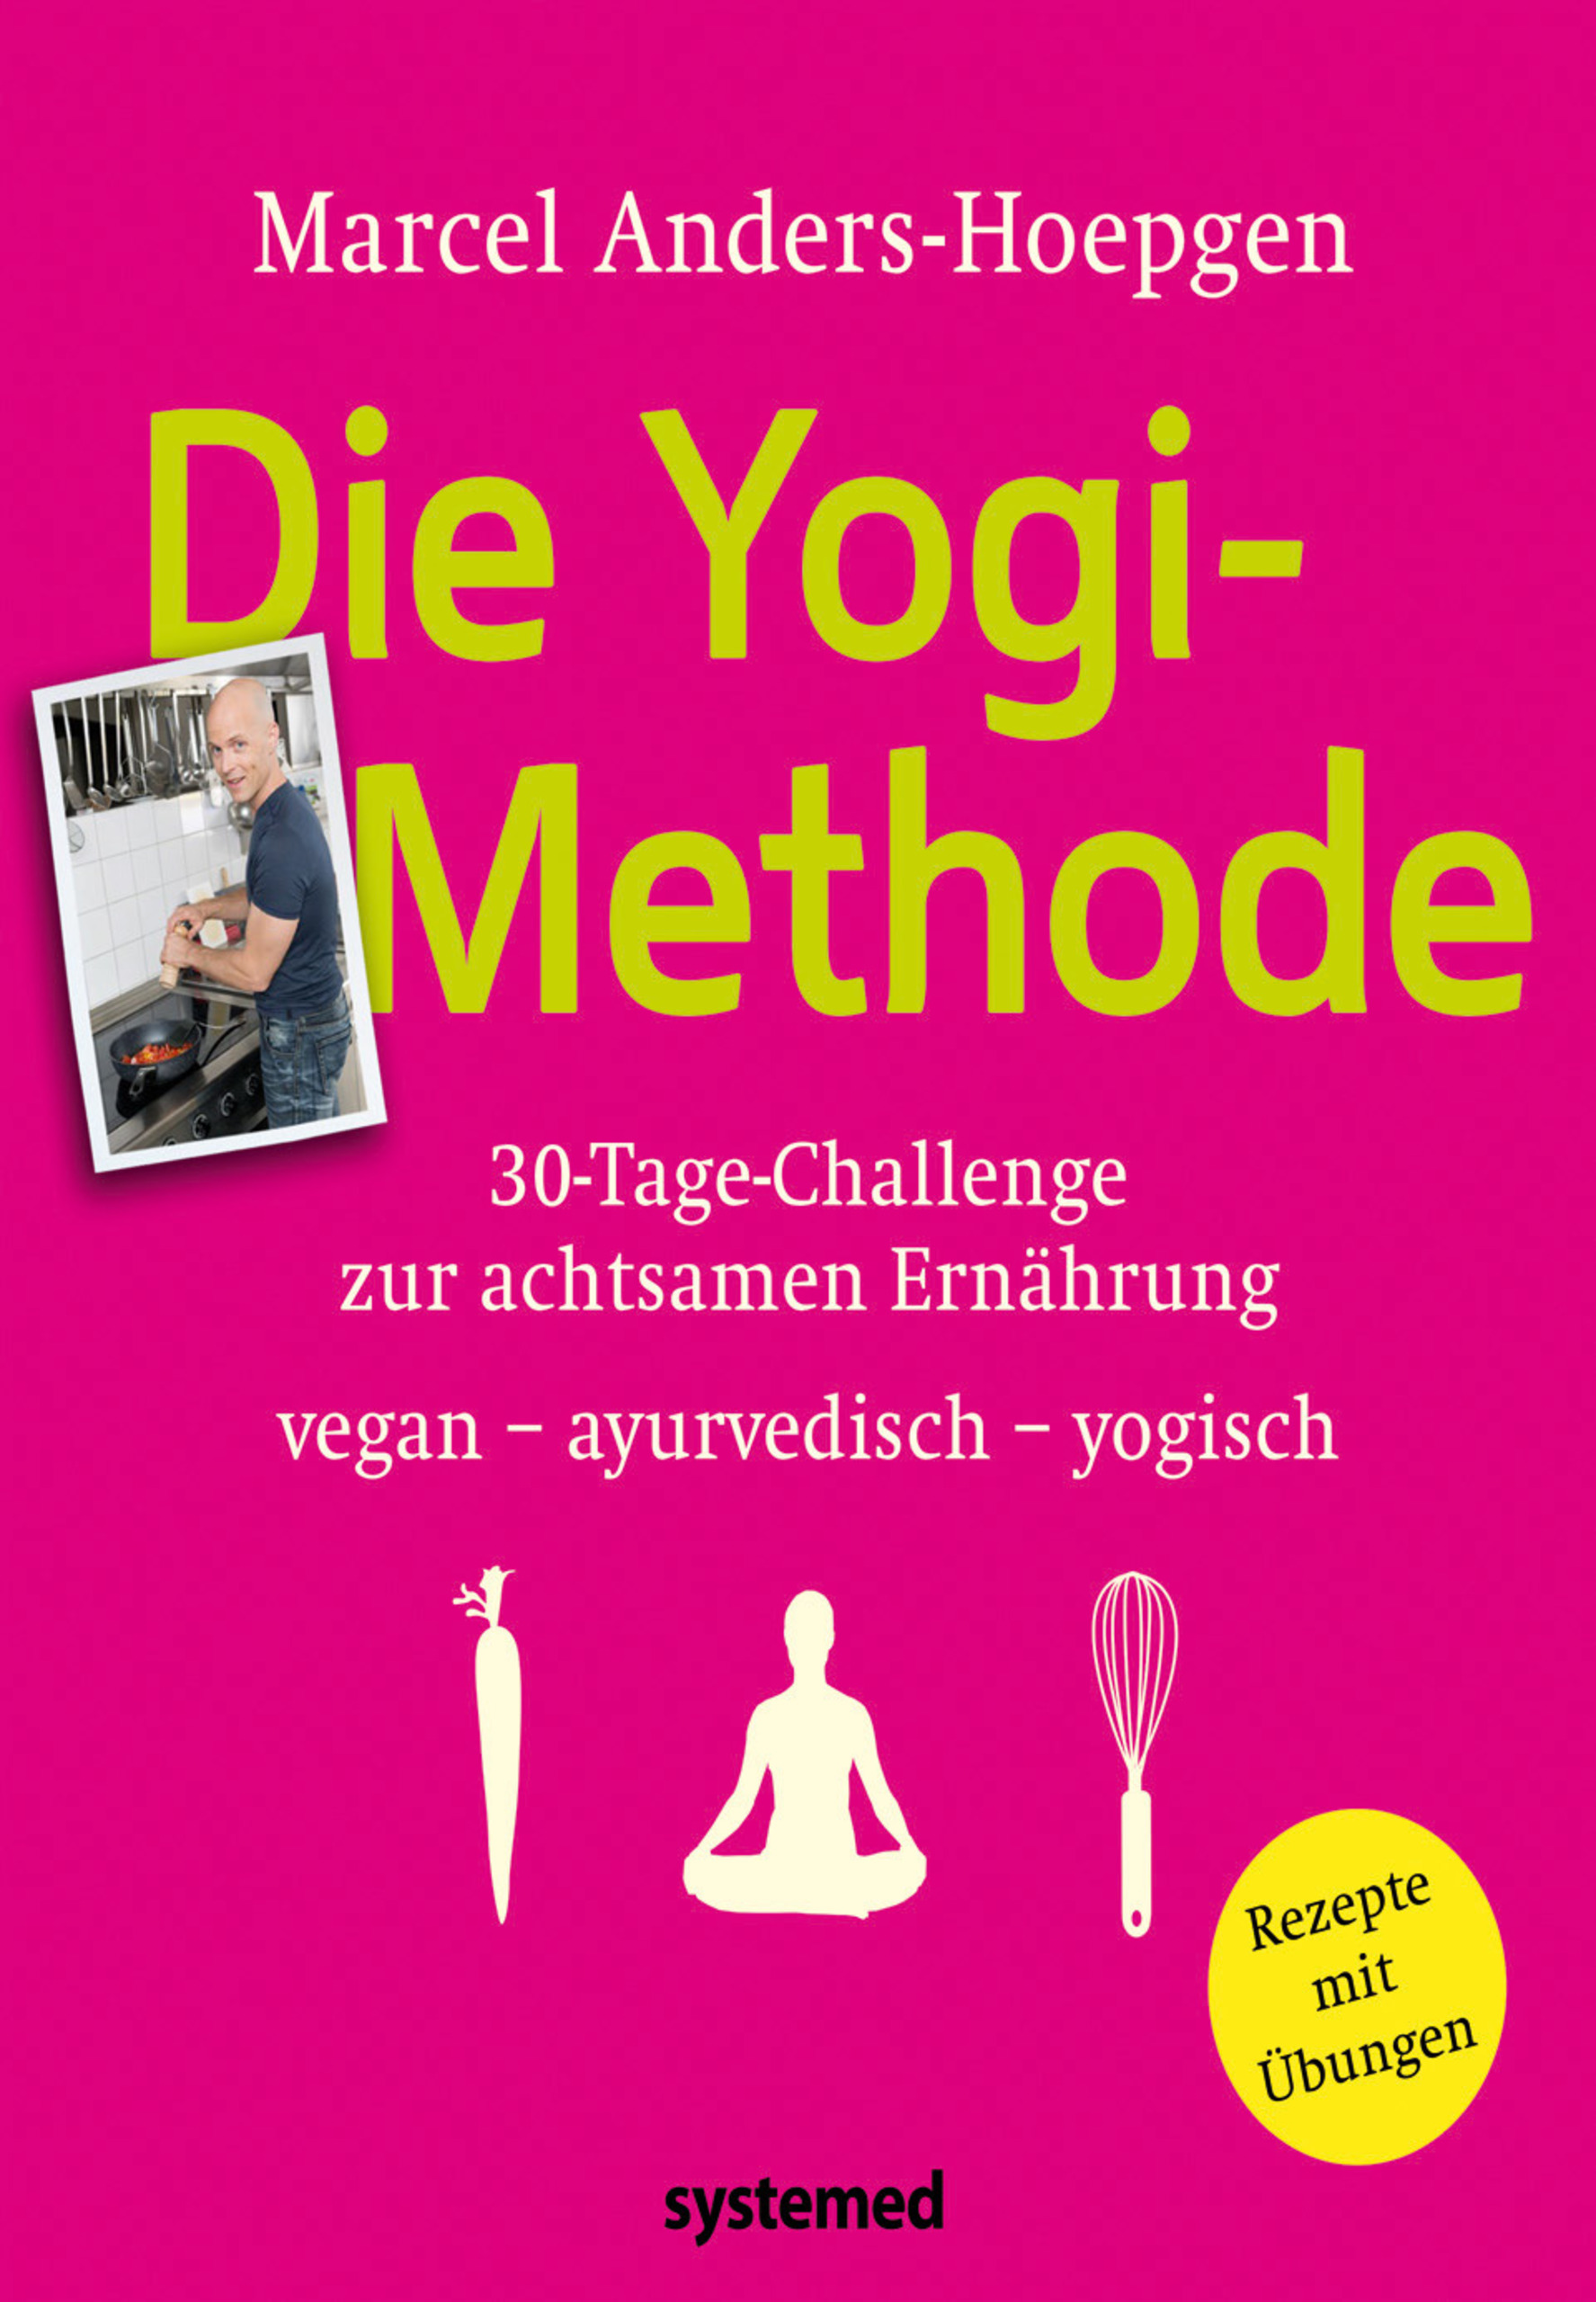 Yoga Xperience Rezensionen 2020 Die Yogi-Methode von Marcel Anders-Hoepgen © Riva